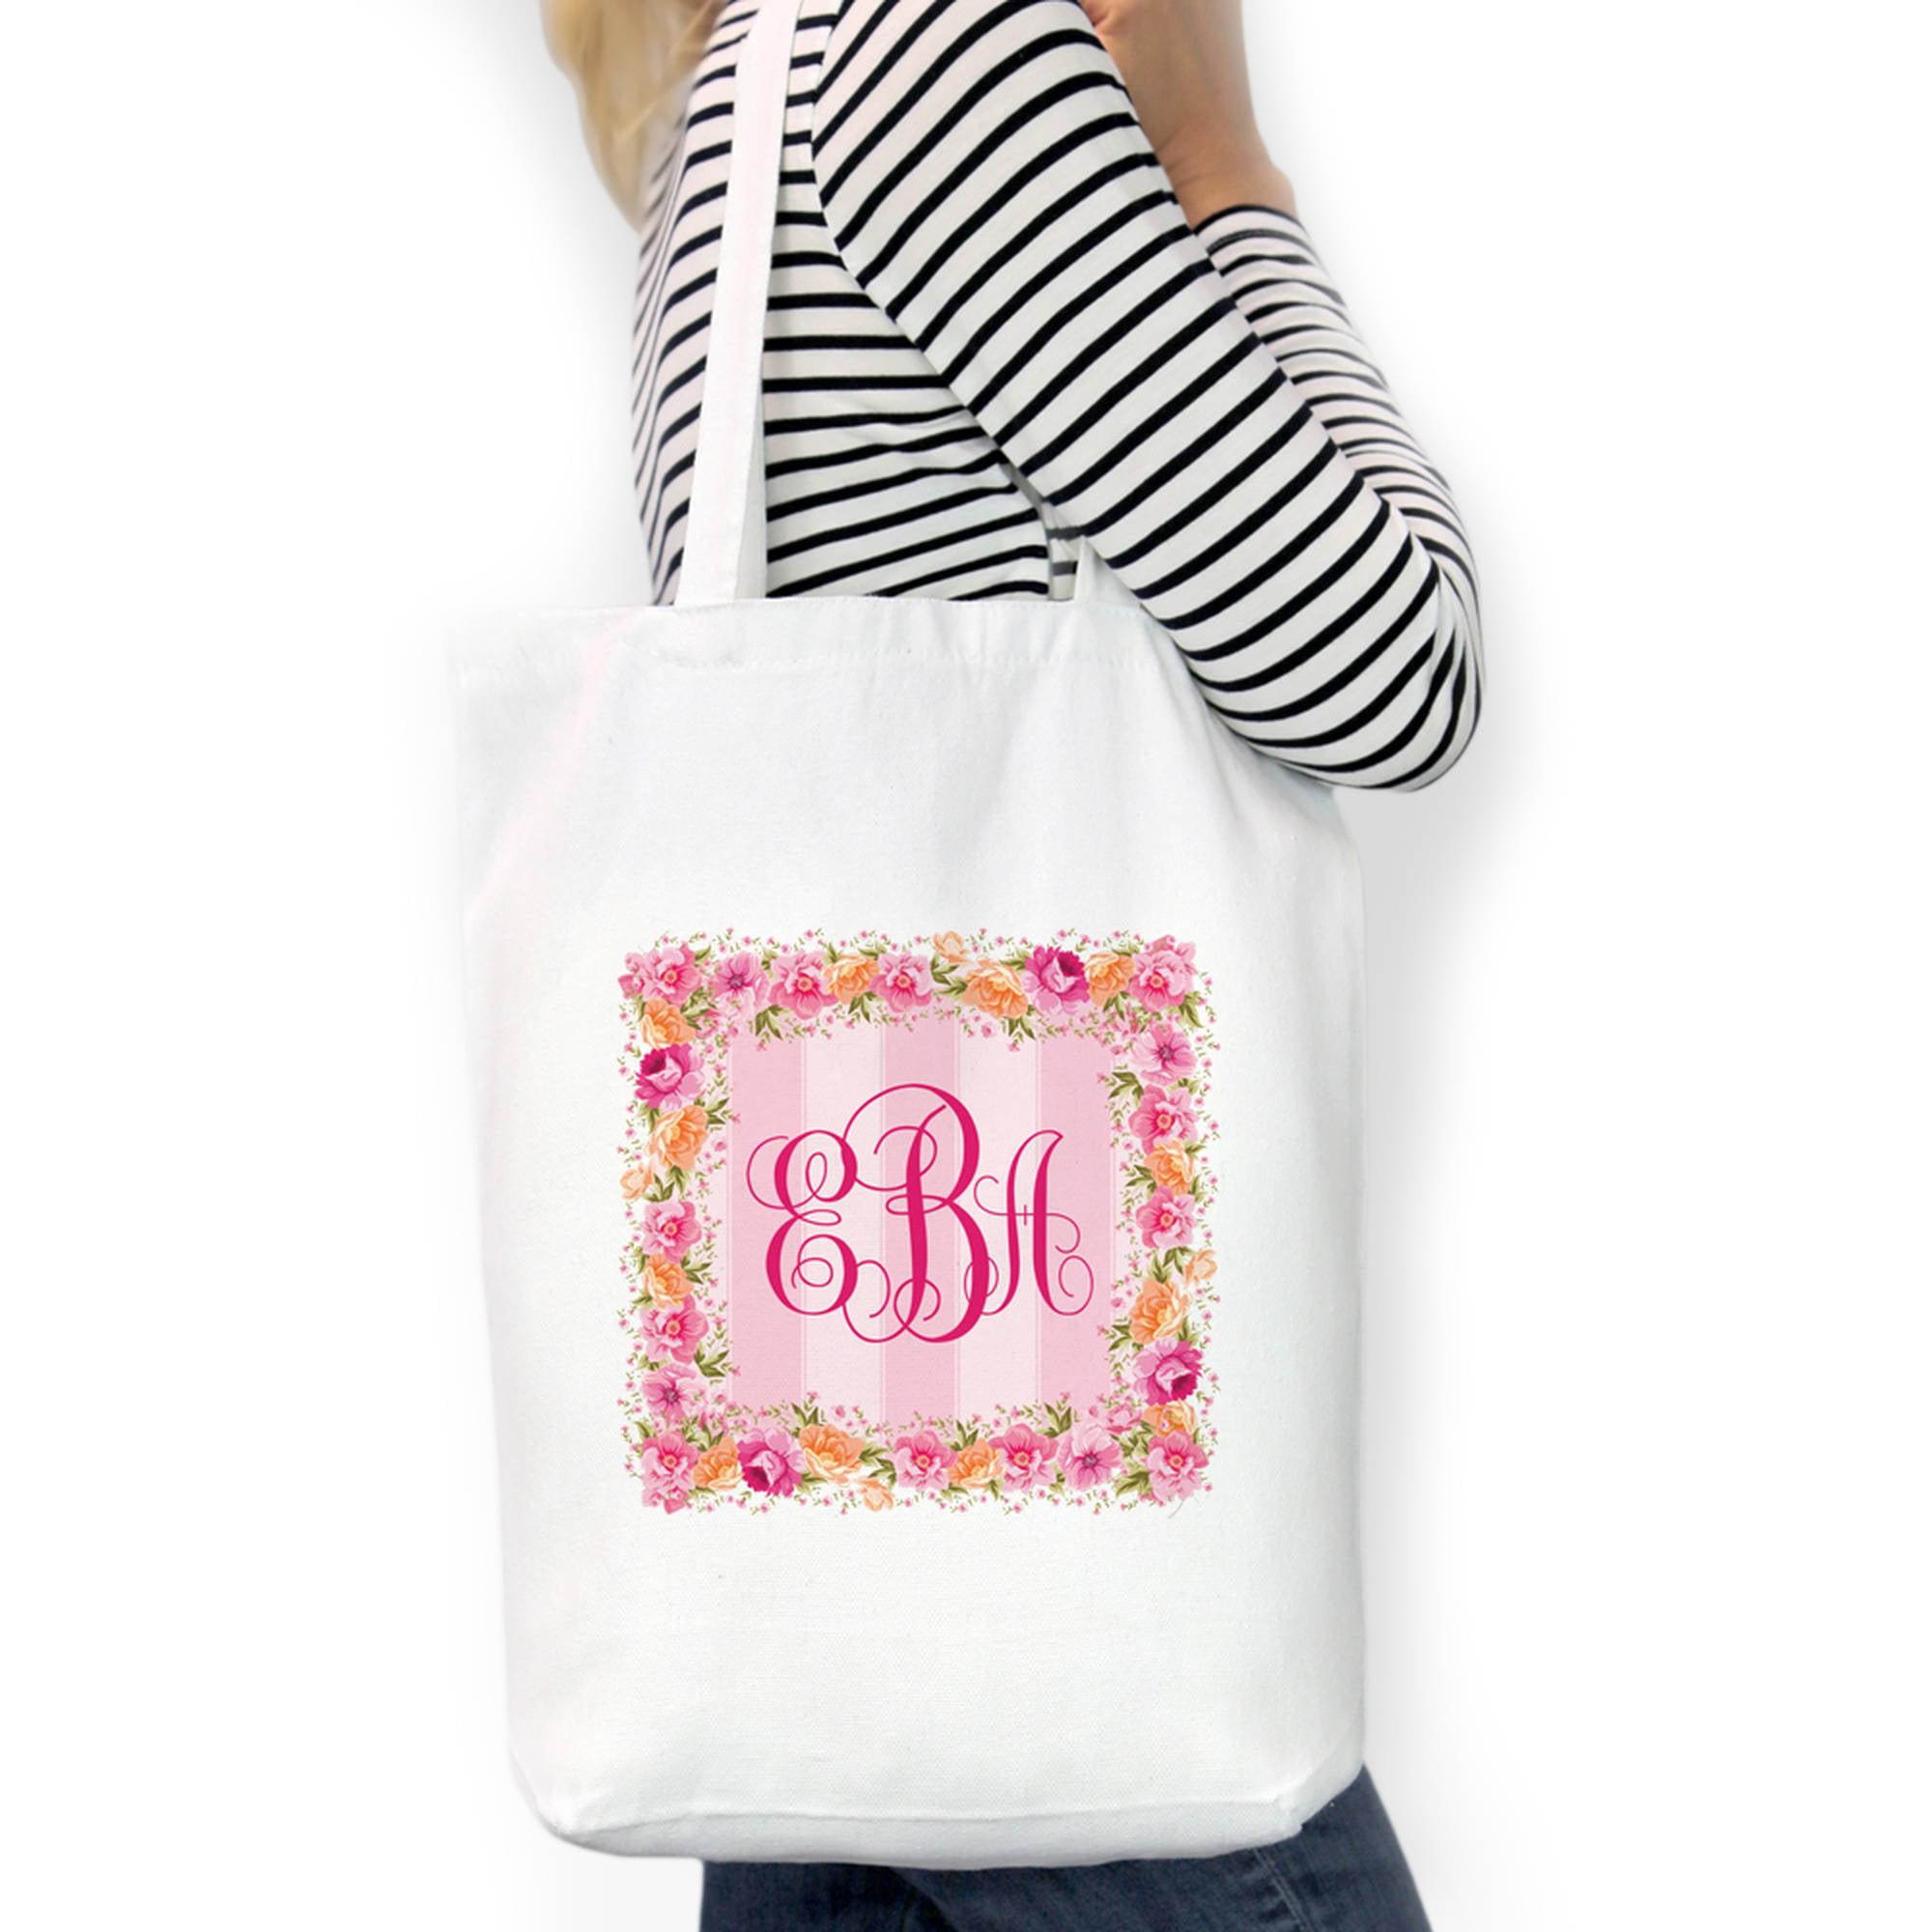 "Monogram Square Wreath Custom Cotton Tote Bag, Sizes 11"" x 14"" and 14.5"" x 18"""